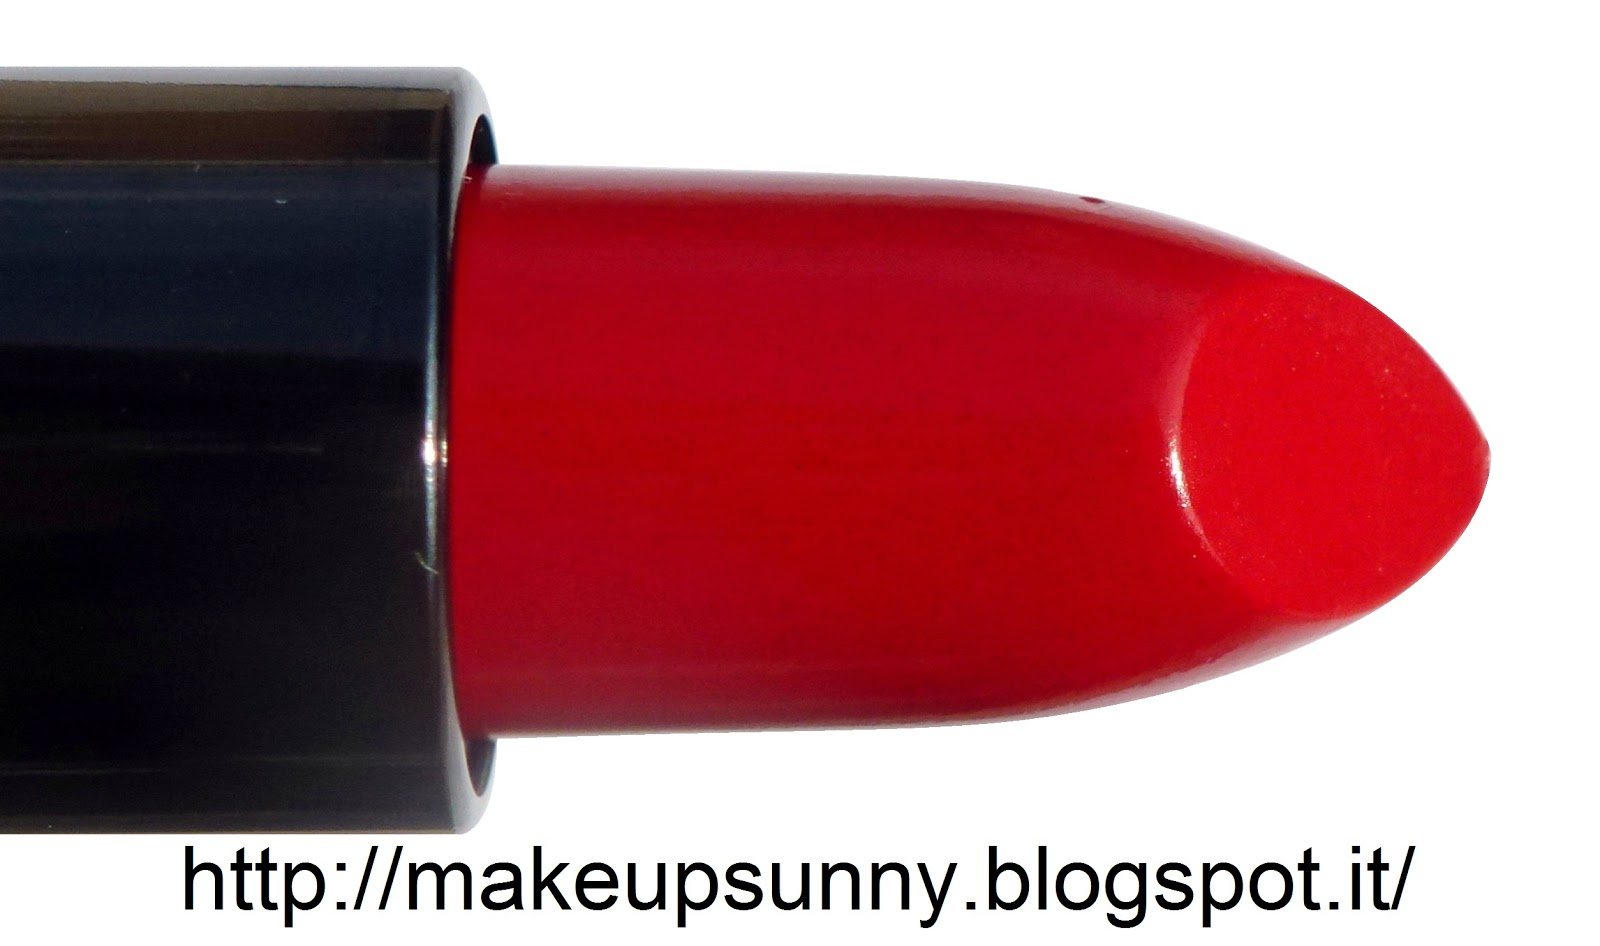 http://4.bp.blogspot.com/-tQ-zEaykE0w/UJbKyDNfjYI/AAAAAAAAIGo/Tu0BPD5X850/s1600/rossetto+rimmel+lasting+finish+kate+moss+10+rosso.jpg